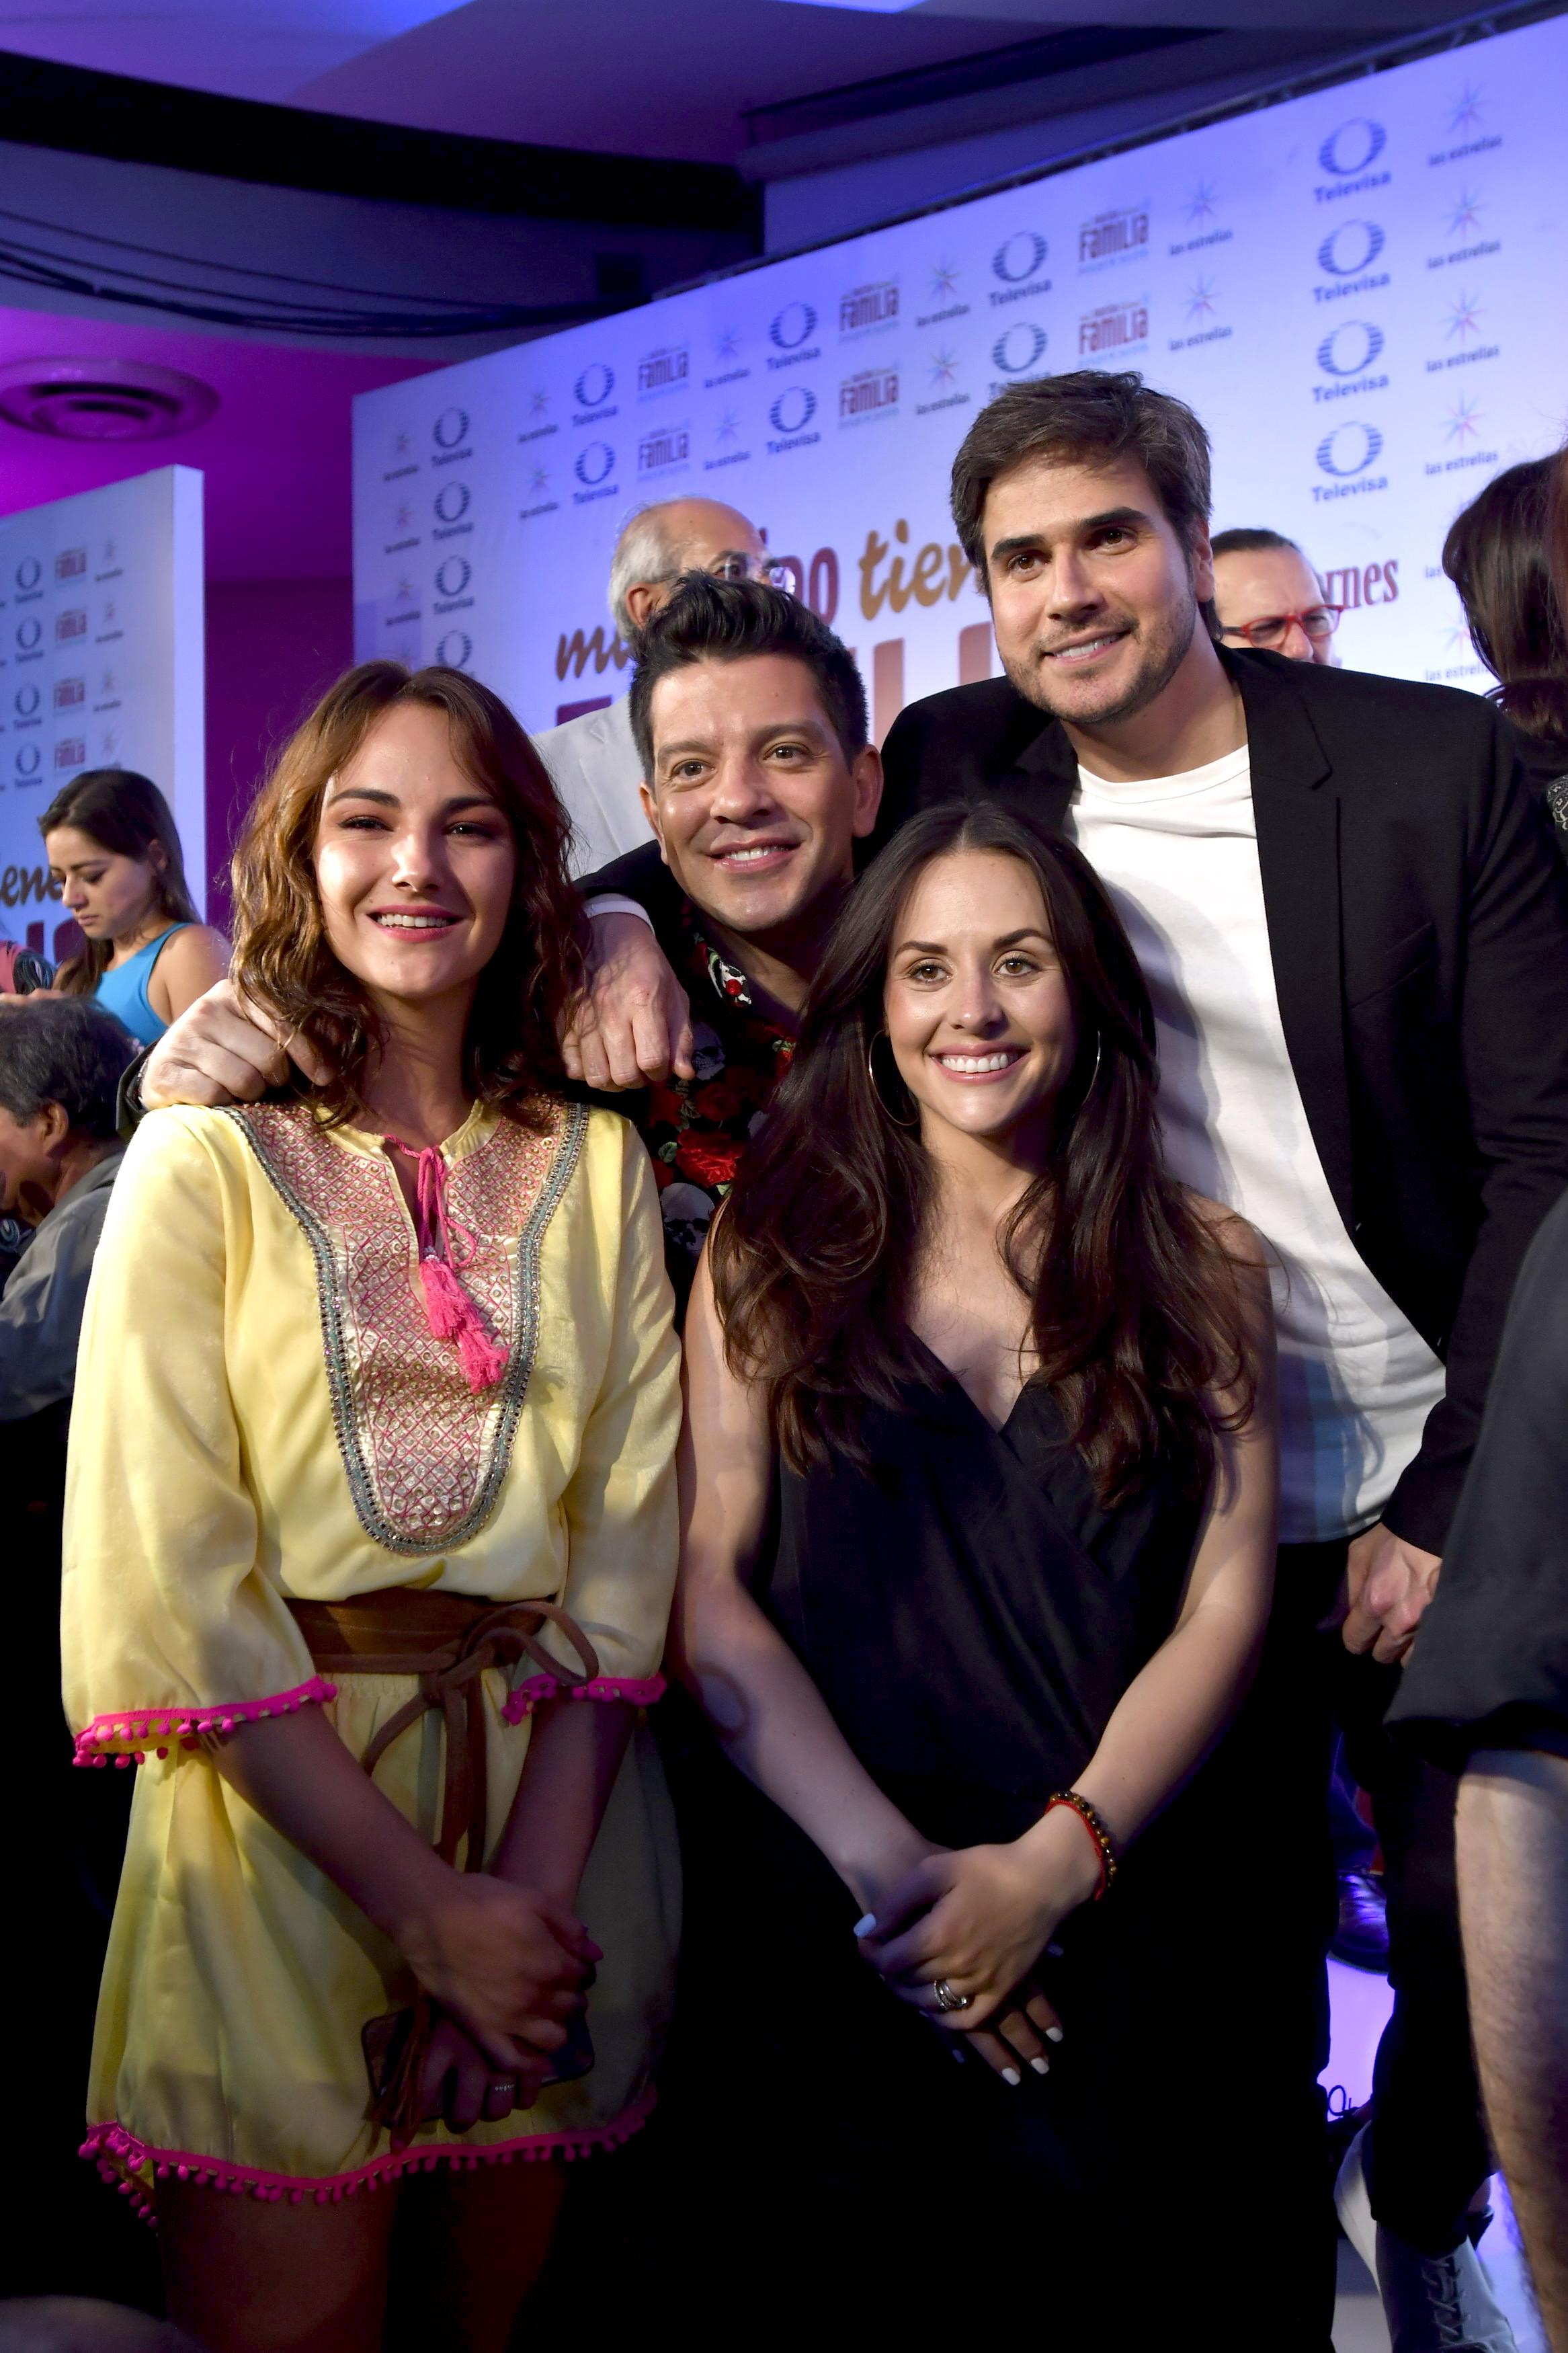 Yahir, Zuria Vega, Daniel Arenas